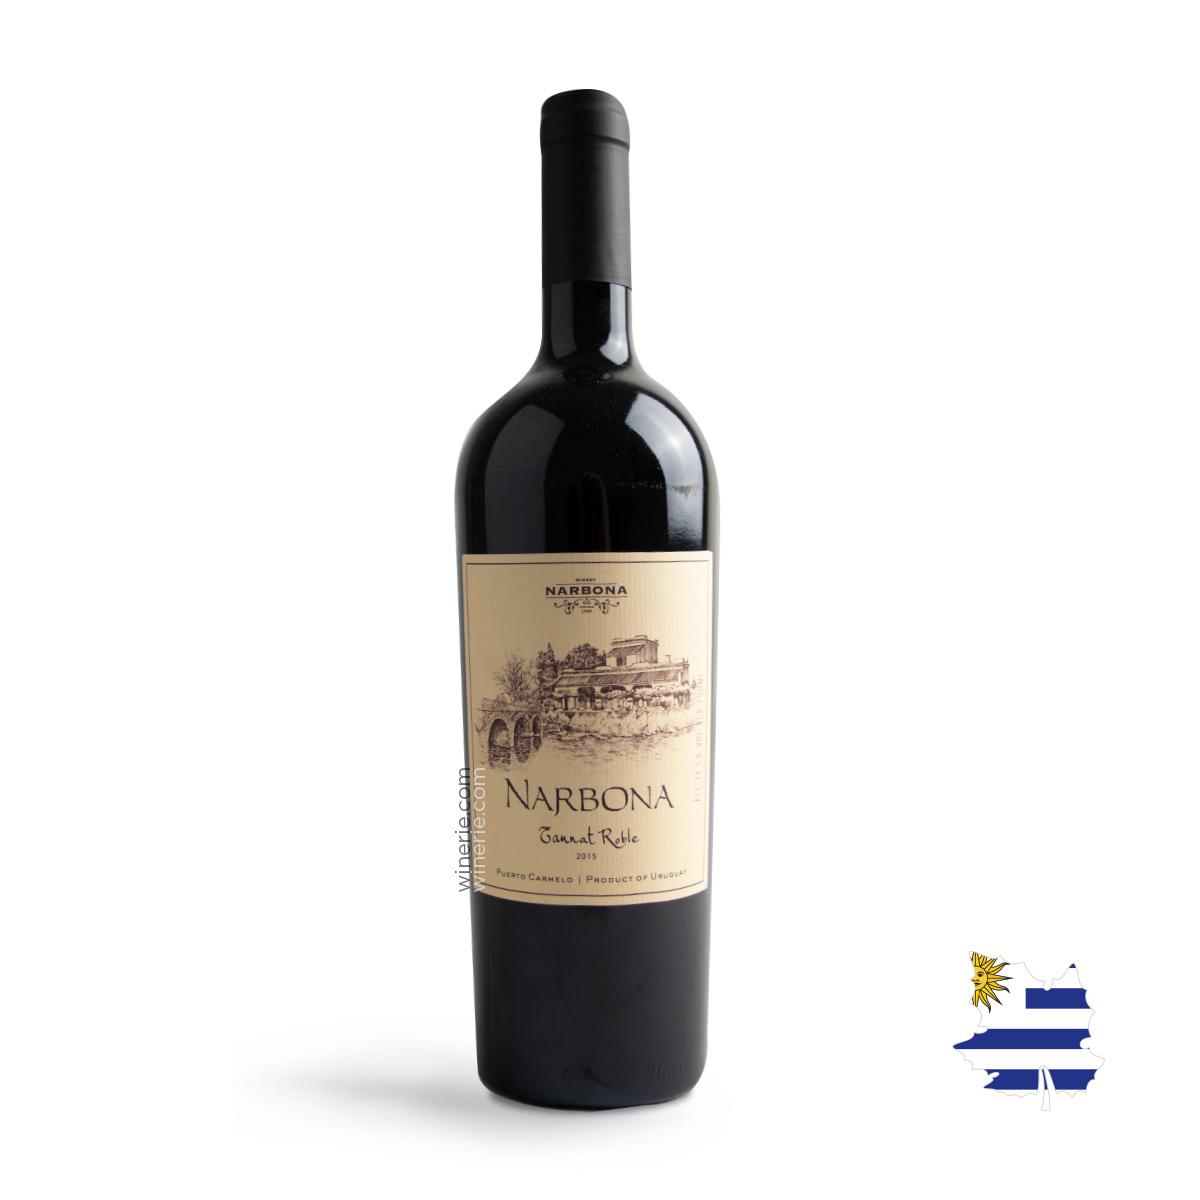 Vinho Uruguaio Narbona Tannat Roble 2015 750ml